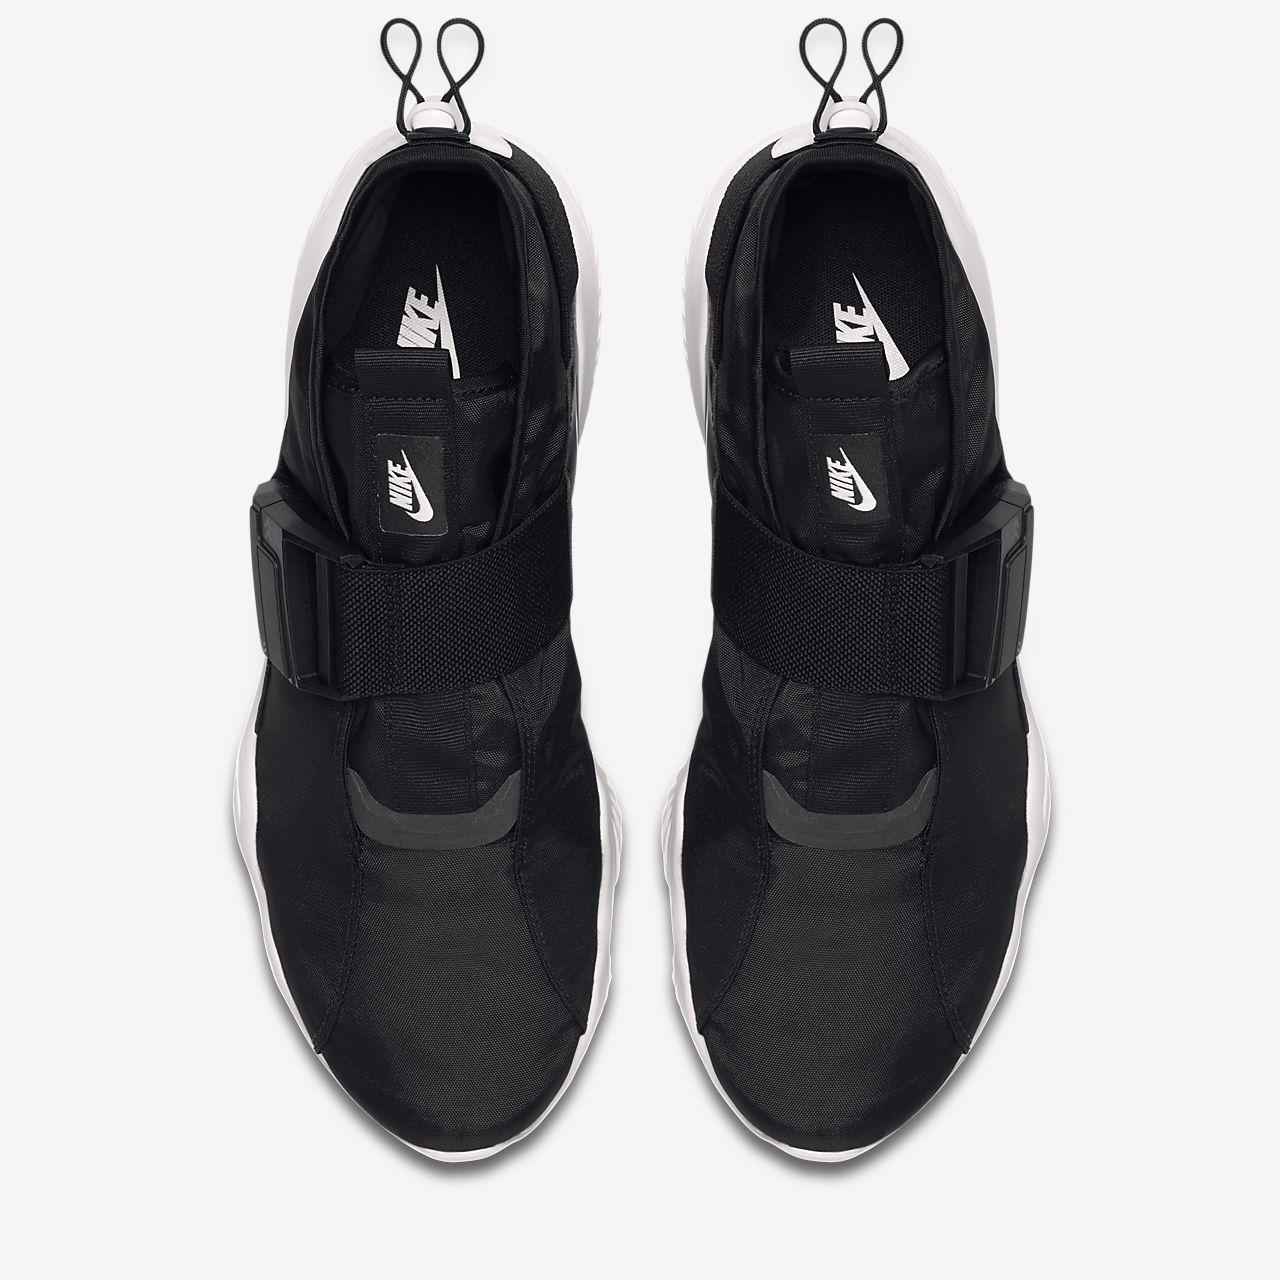 watch e6ec3 f1db0 Low Resolution Nike Komyuter Men s Shoe Nike Komyuter Men s Shoe